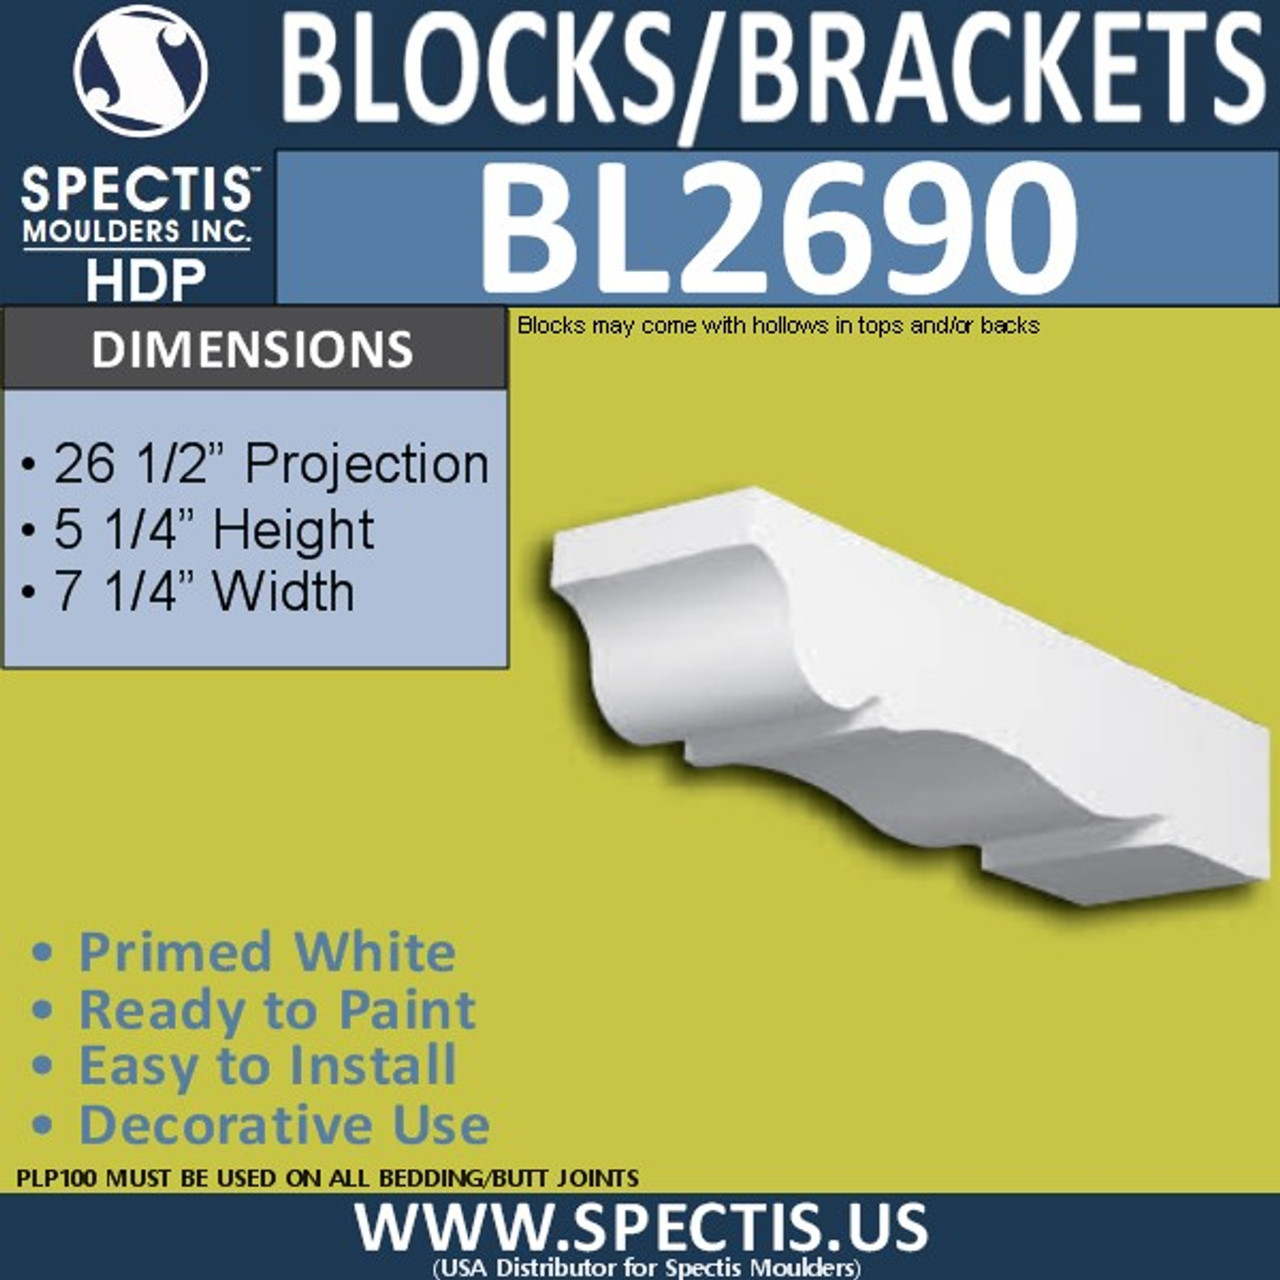 "BL2690 Eave Block or Bracket 7.25""W x 5.25""H x 26.5"" P"